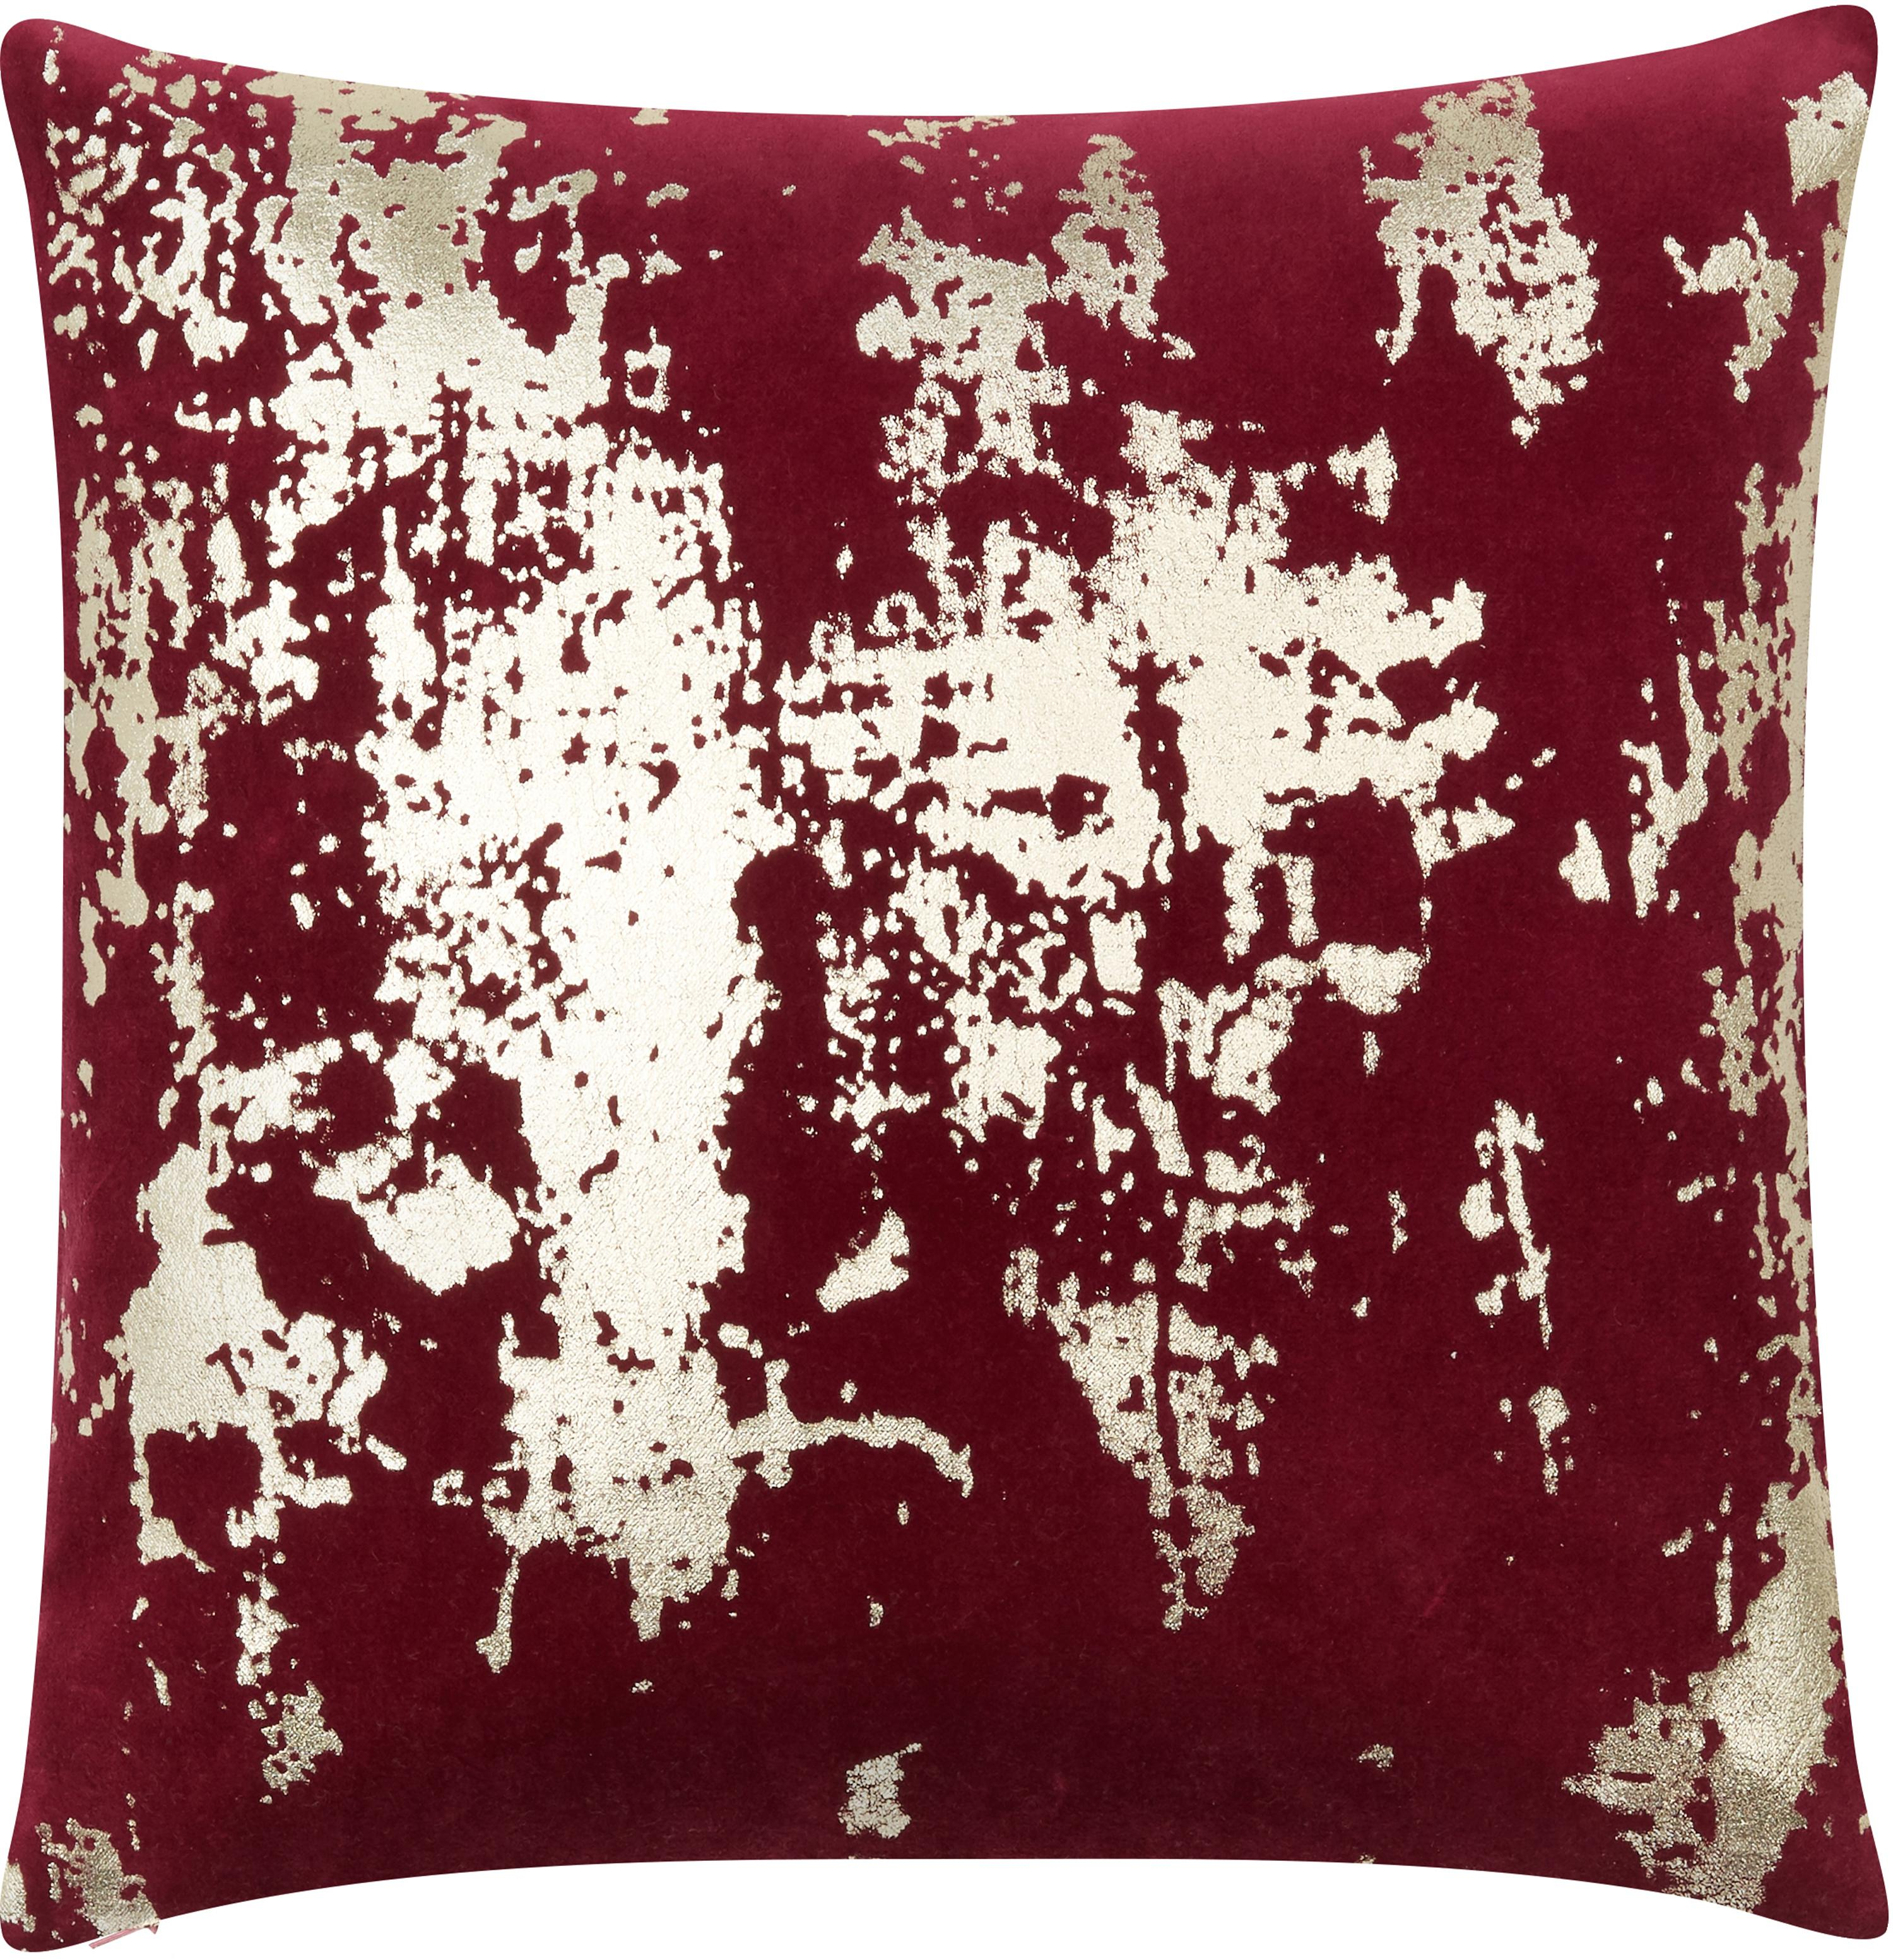 Samt-Kissenhülle Shiny mit schimmerndem Vintage Muster, Baumwollsamt, Rot, Goldfarben, 40 x 40 cm